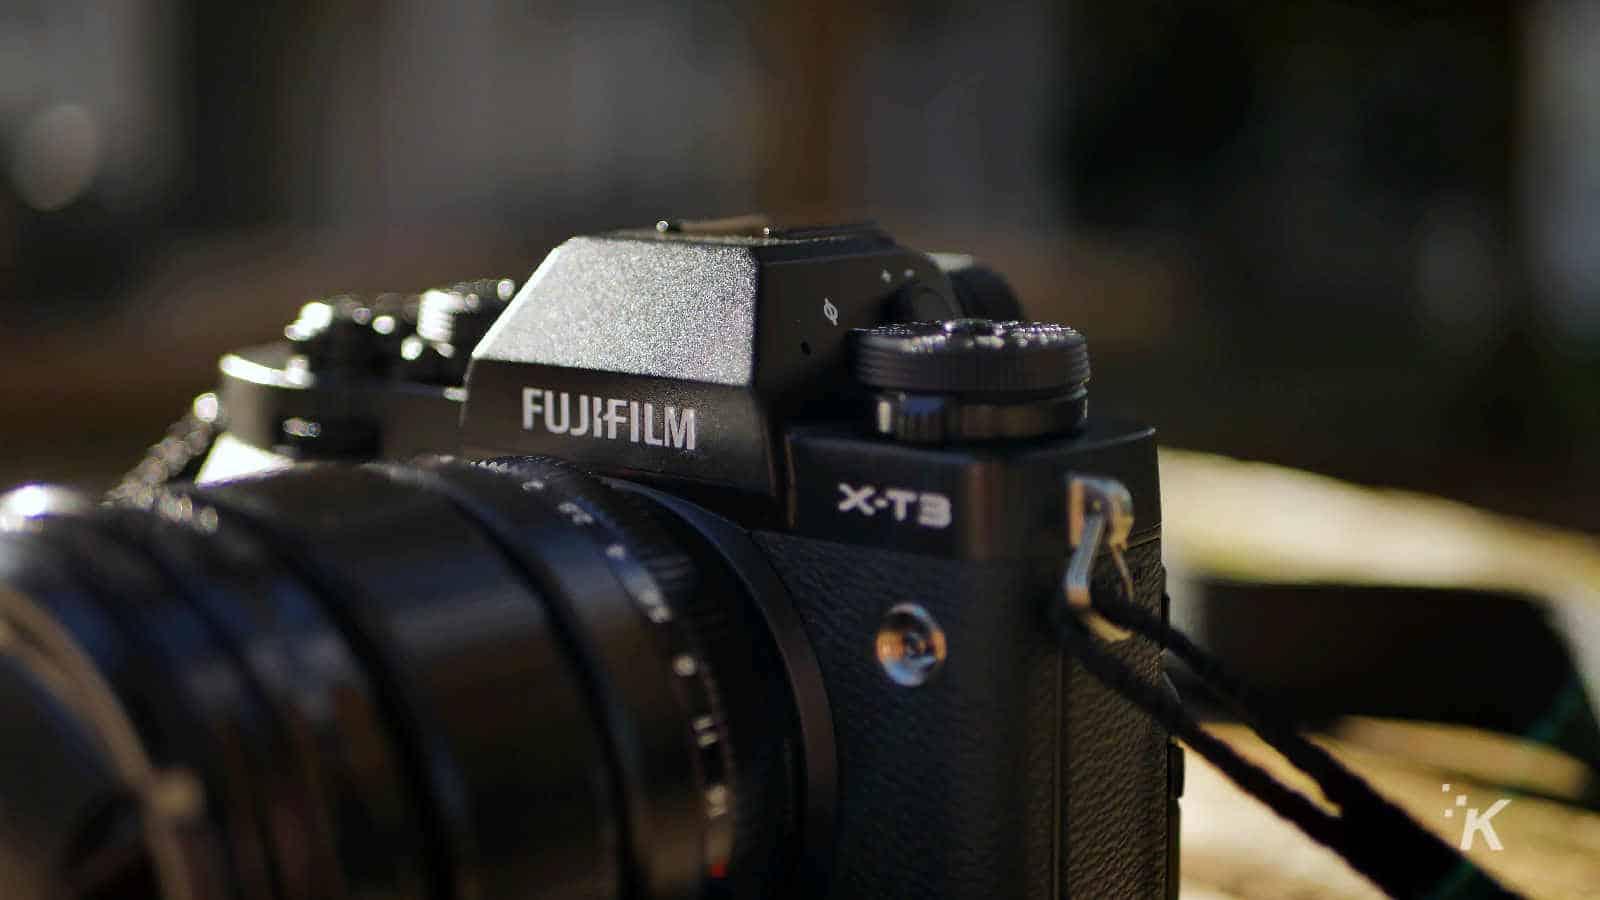 fujifilm xt3 camera on table